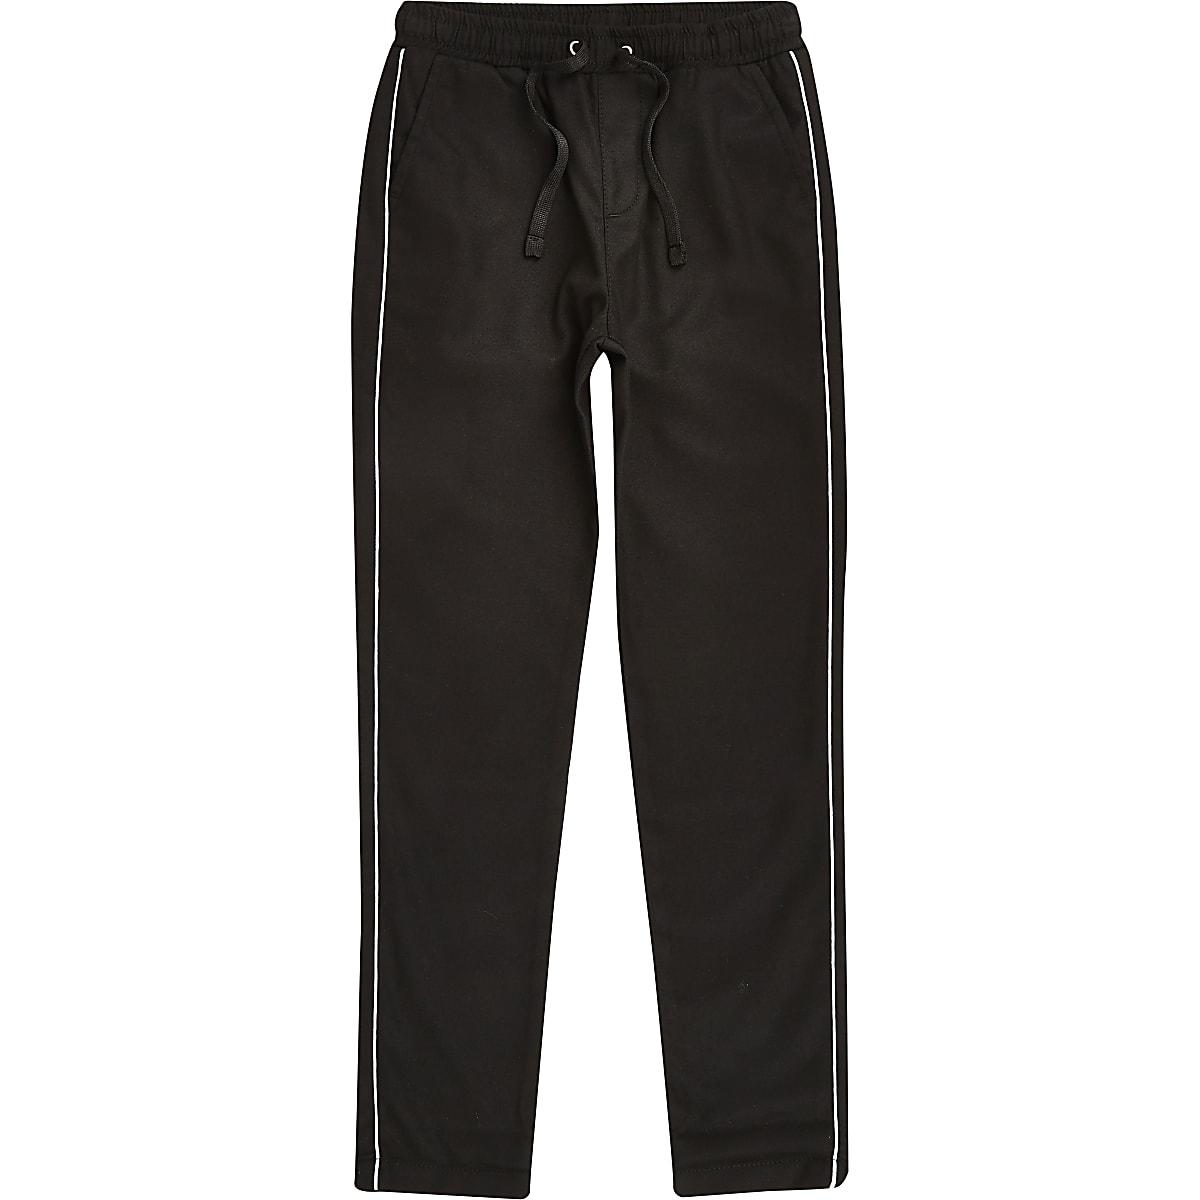 Boys black piped smart pants